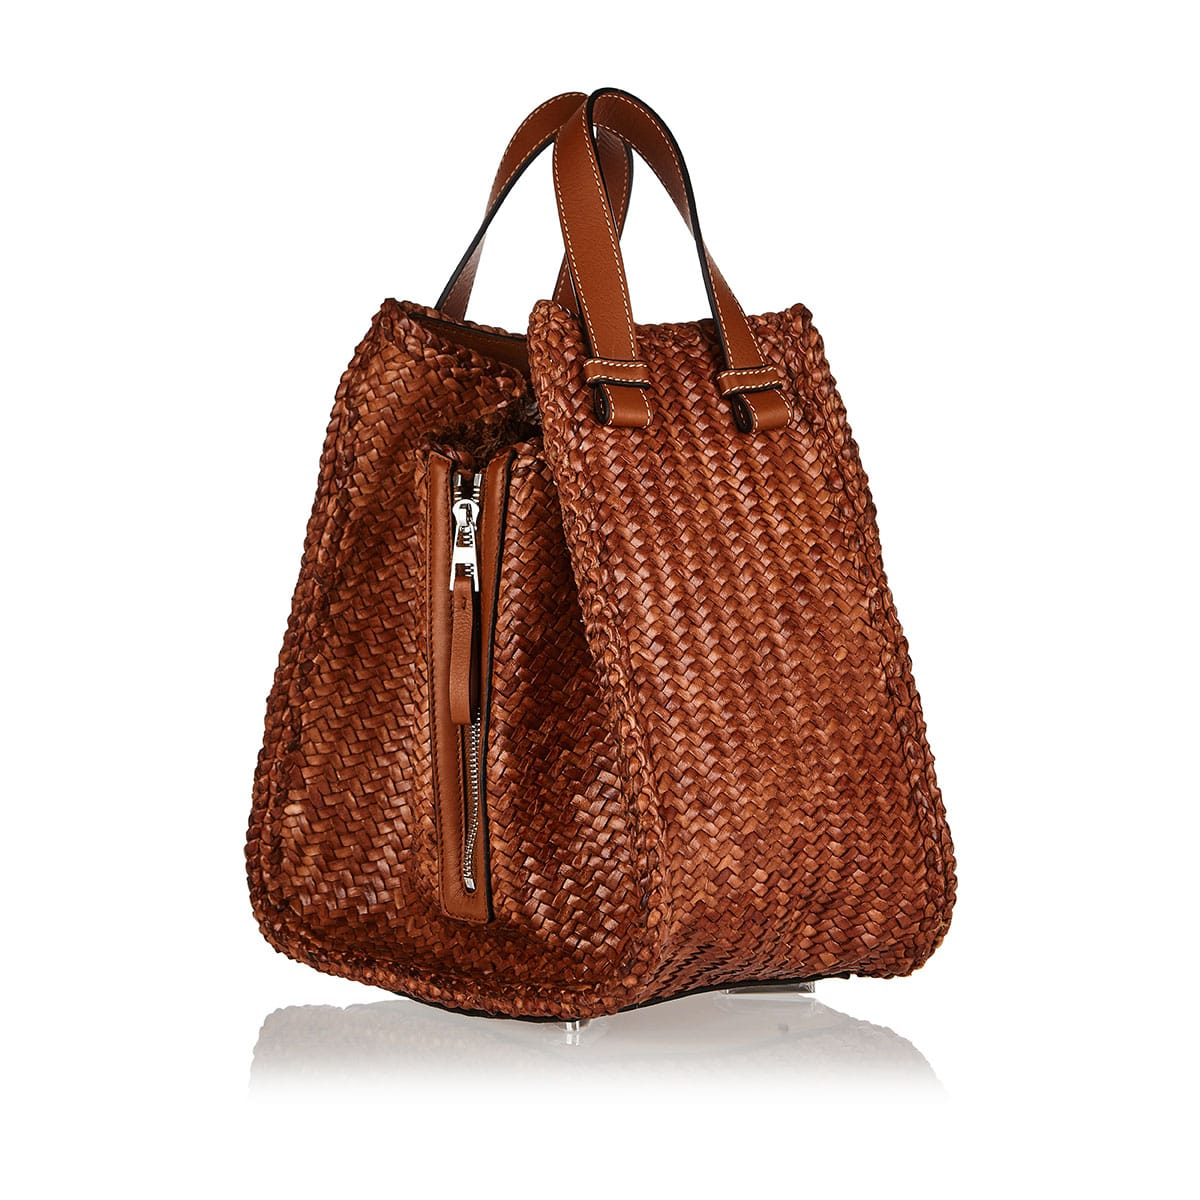 Hammock medium leather-woven bag